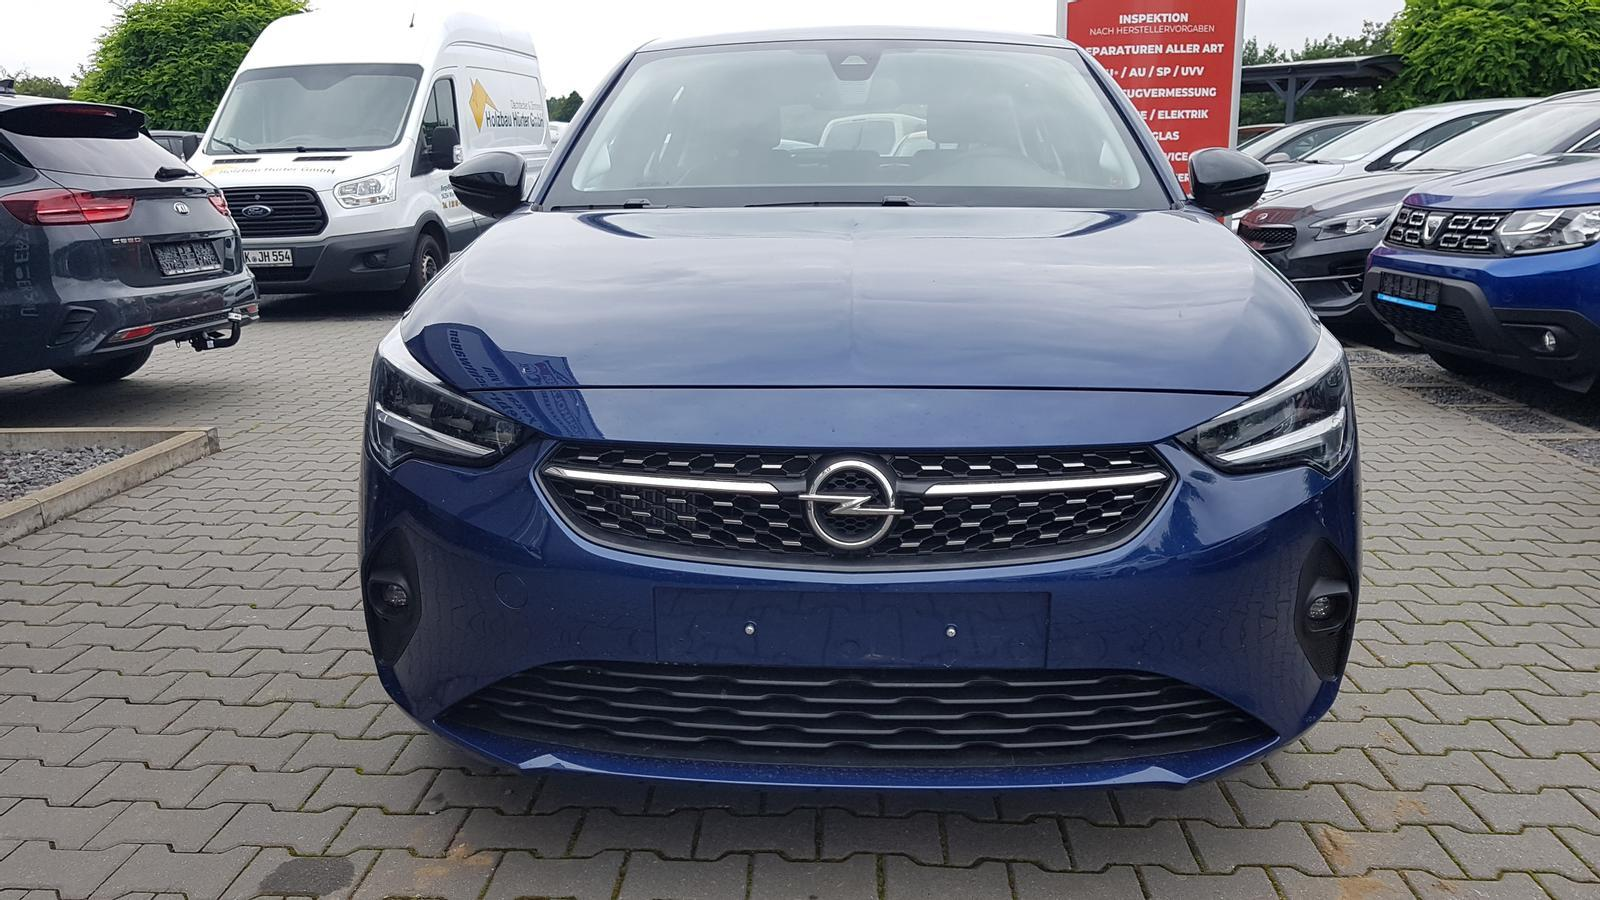 Opel Corsa F Edition*LED*Shzg*PDC*16Zoll*DAB*AppCon*